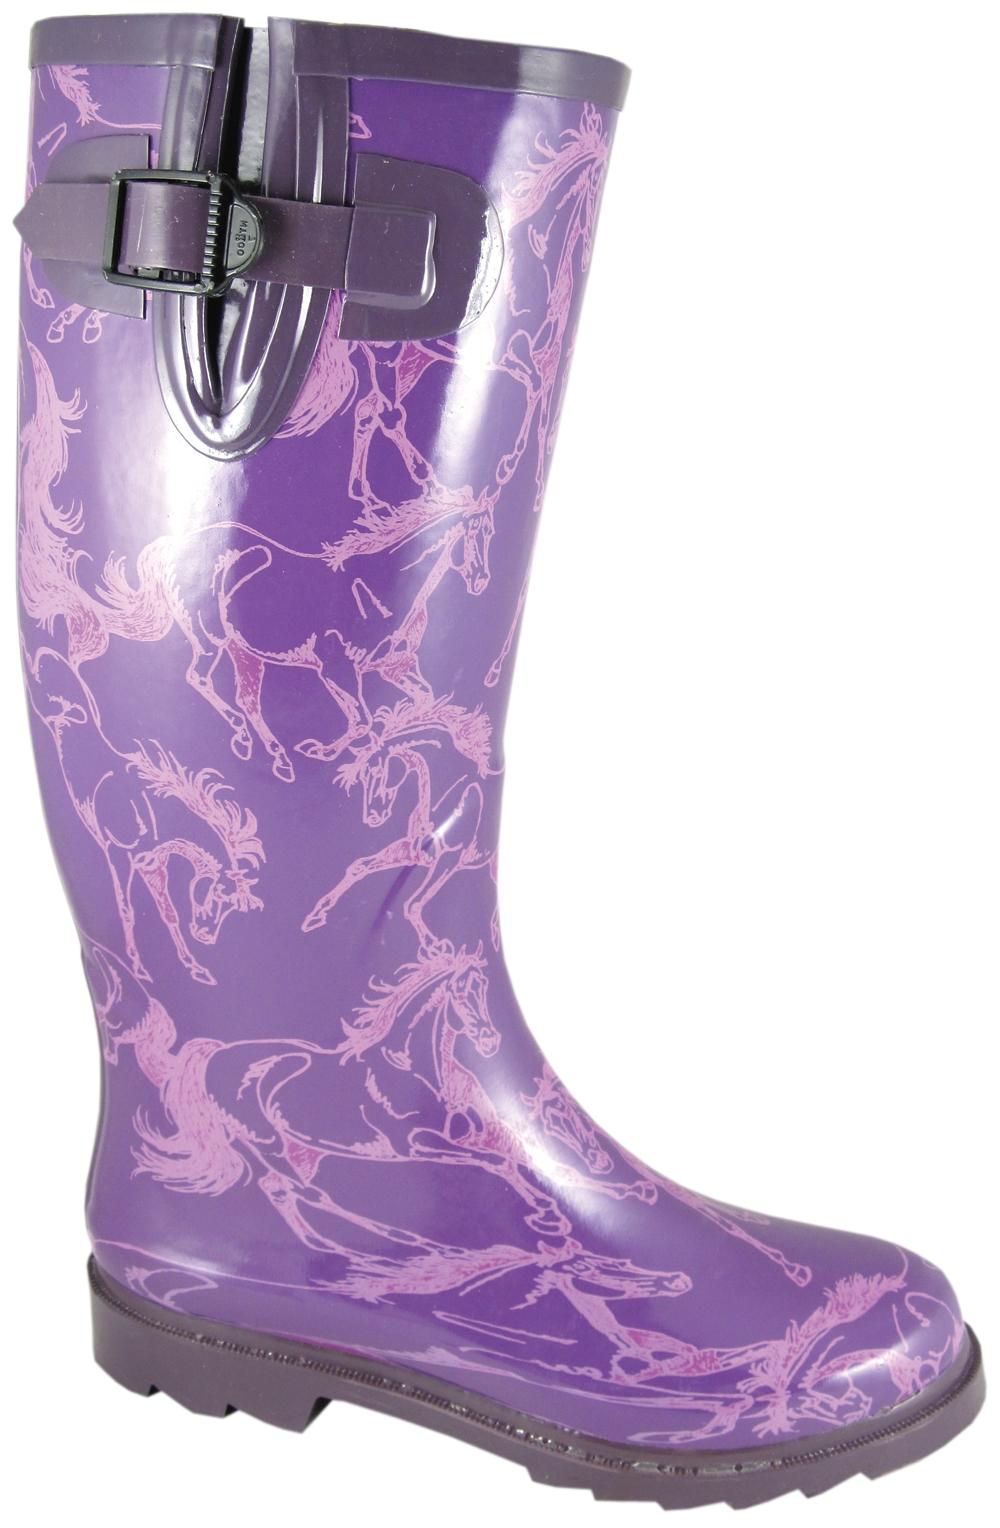 Smoky Mountain Women's Dancing Horses Waterproof Boots